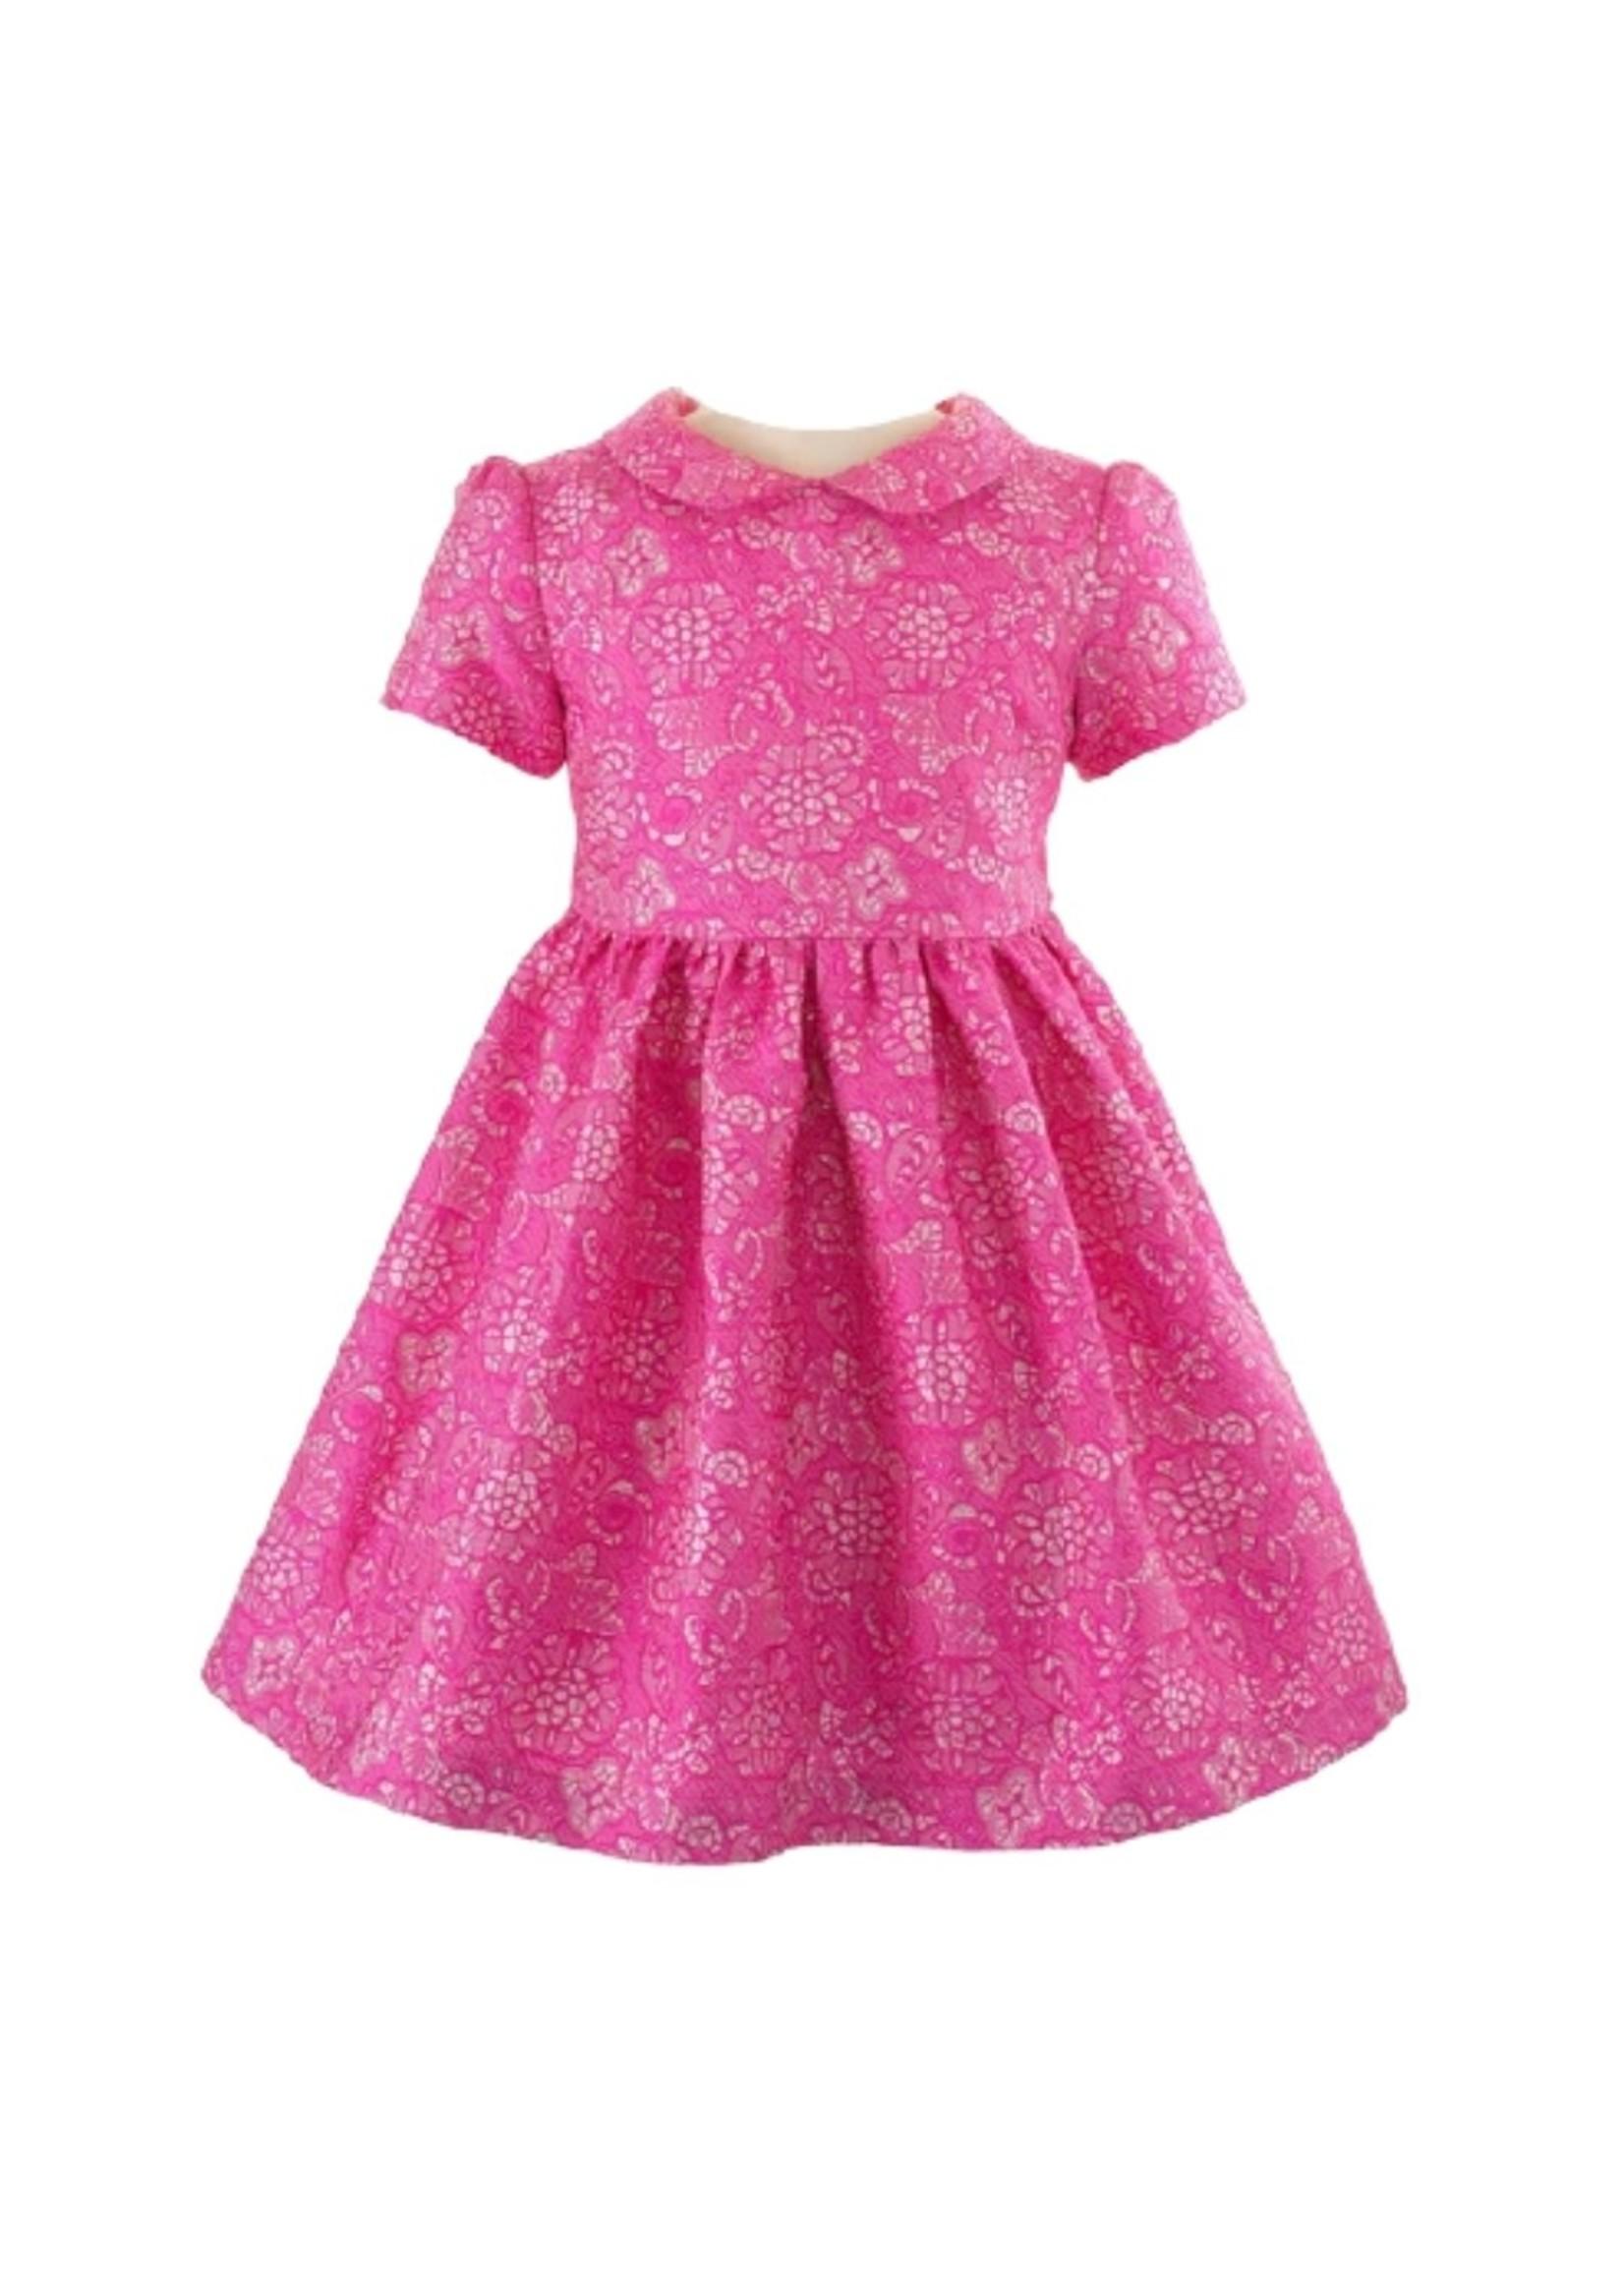 Rachel Riley Rachel Riley Lace Damask Party Dress